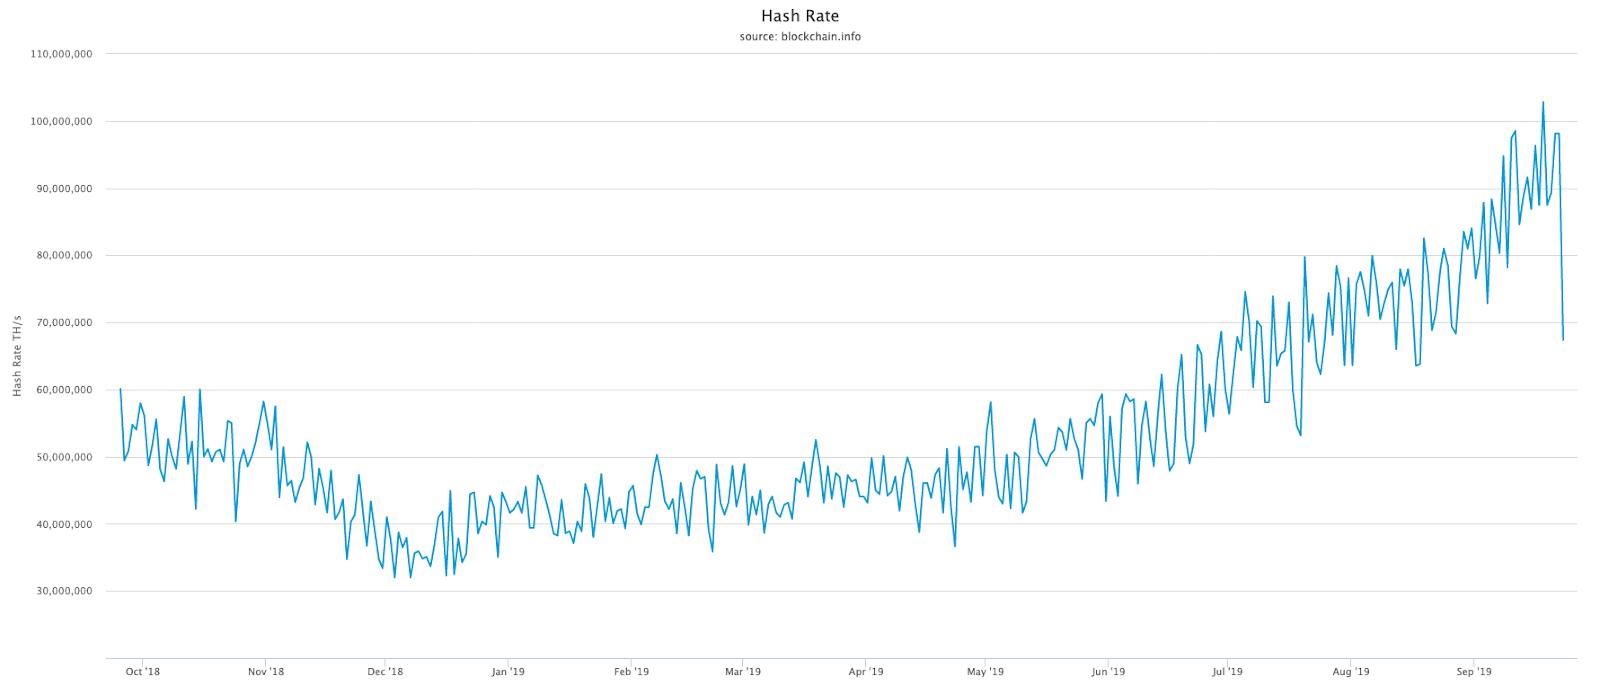 Bitcoin hash rate graph